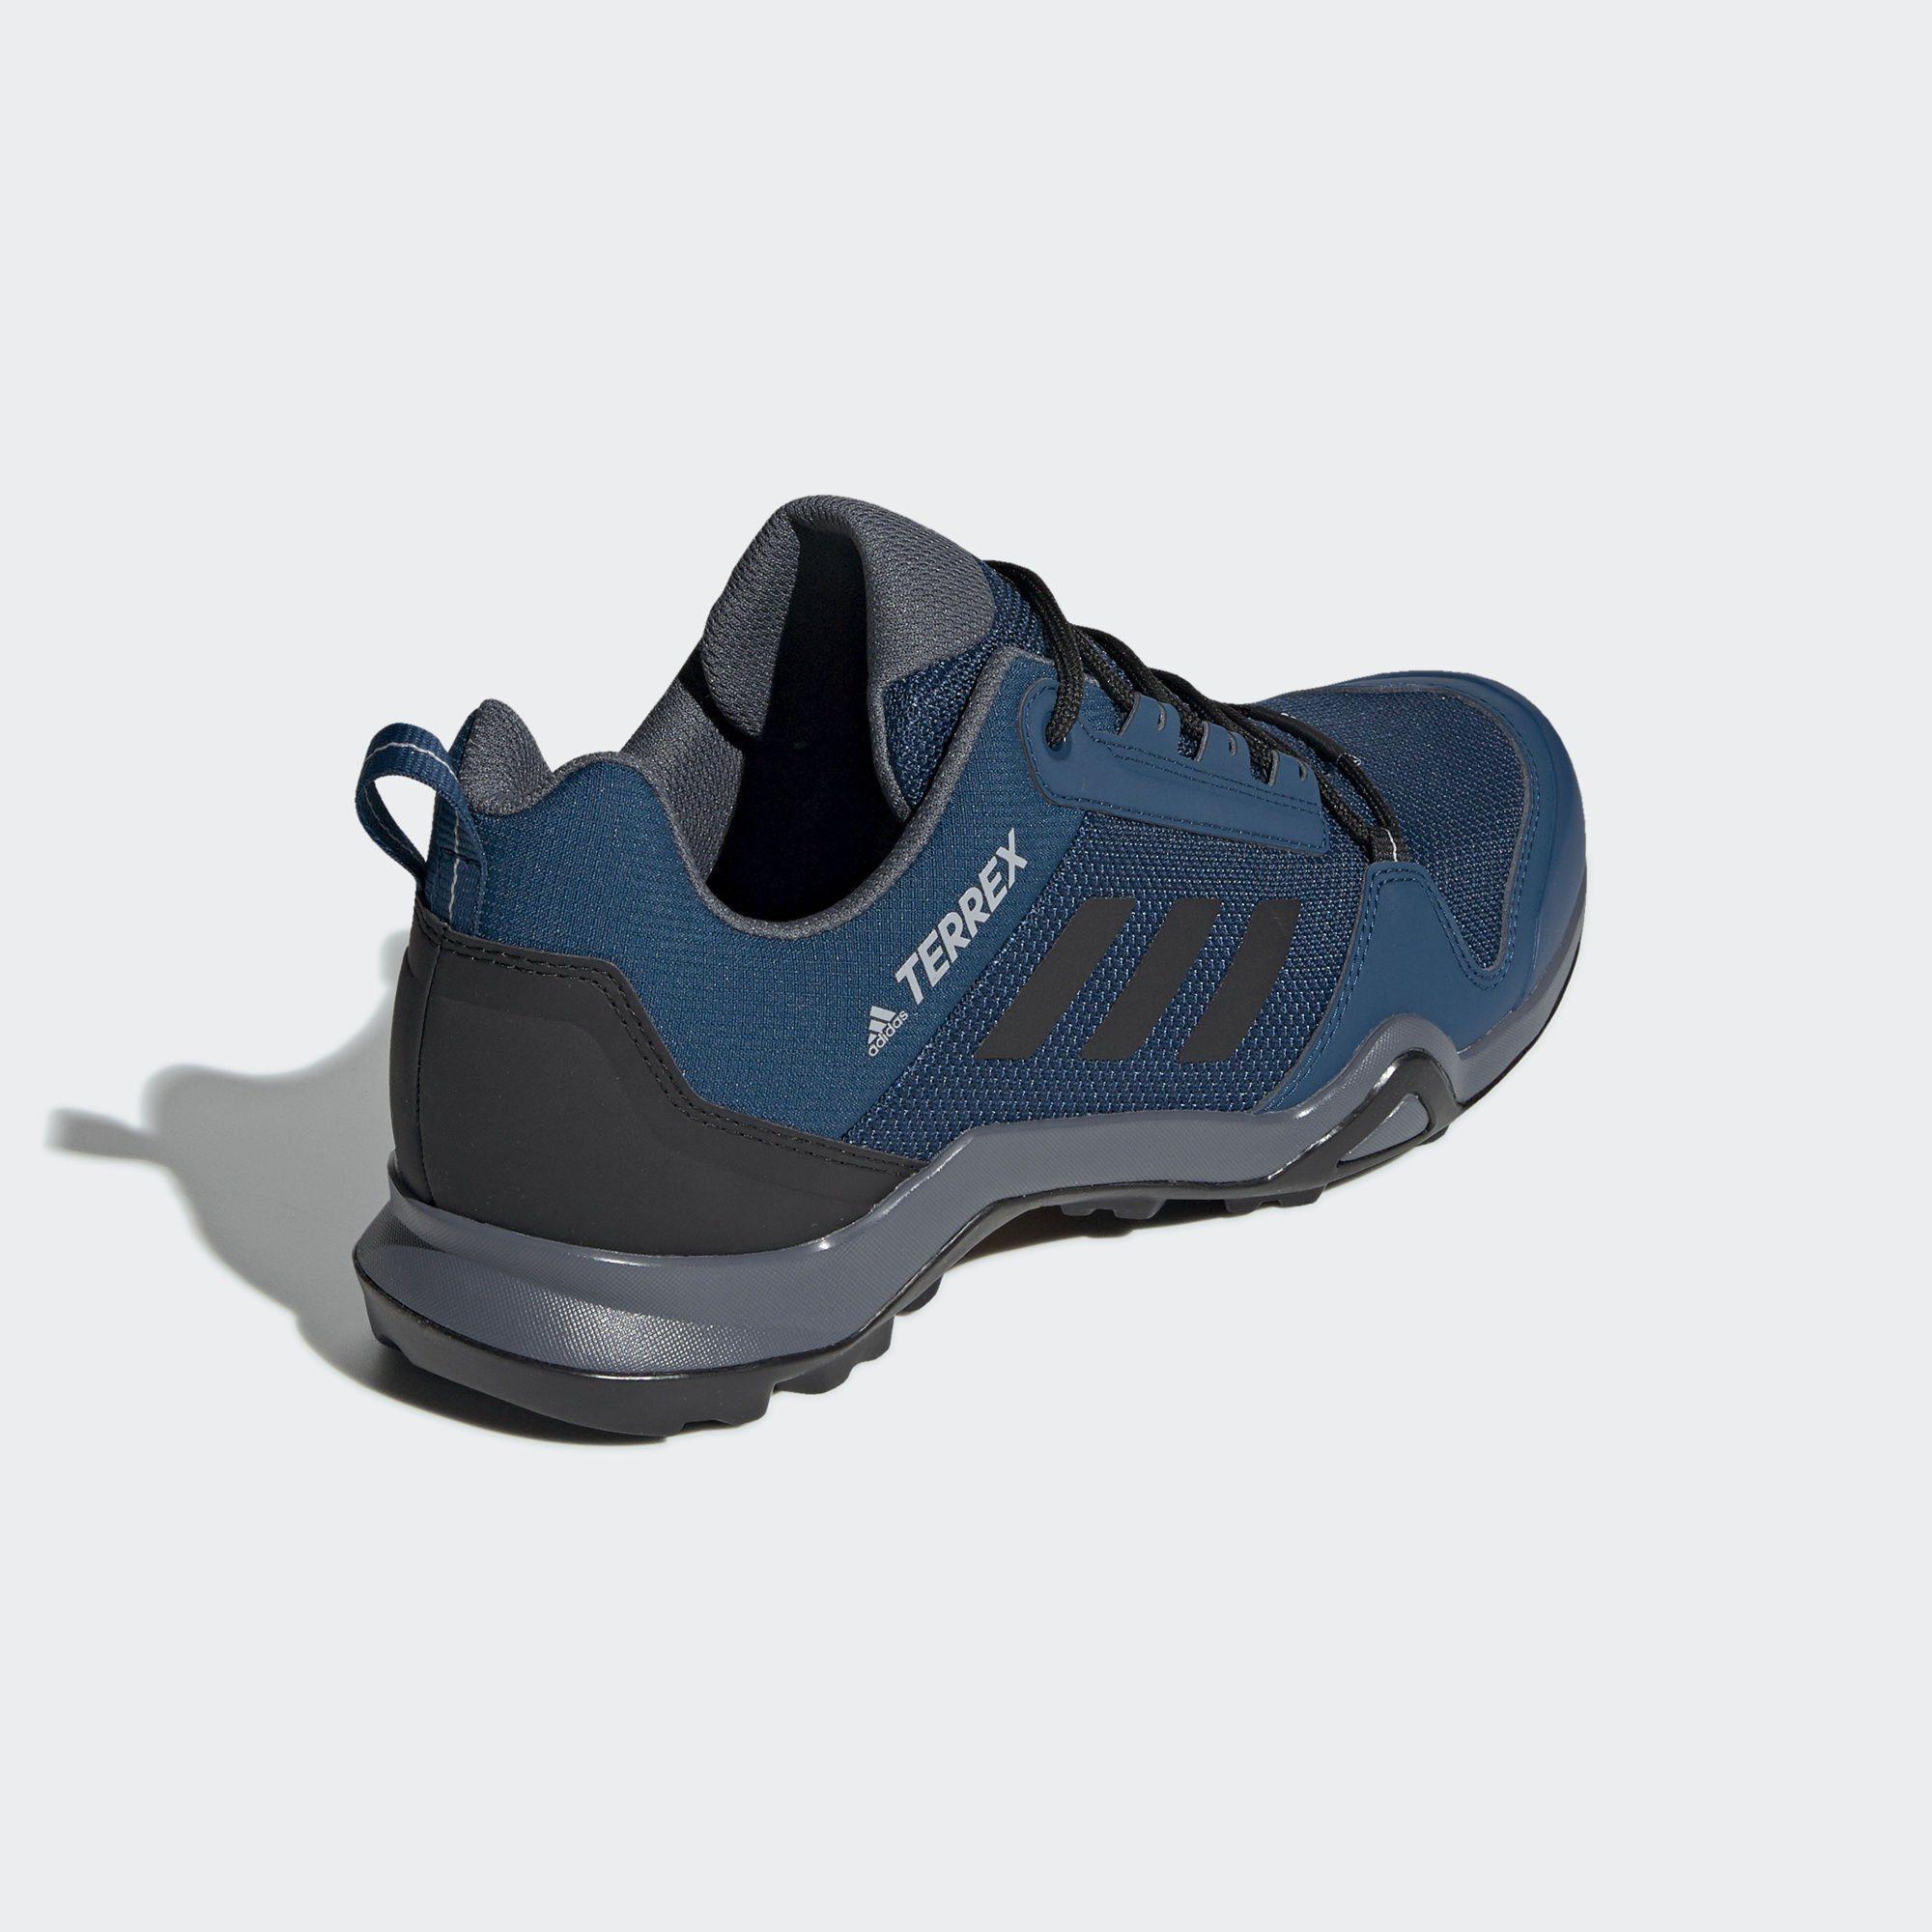 Schuh 7165921299 nr Fitnessschuh Adidas Artikel Blue Terrex Performance Ax3 AgWSa7q